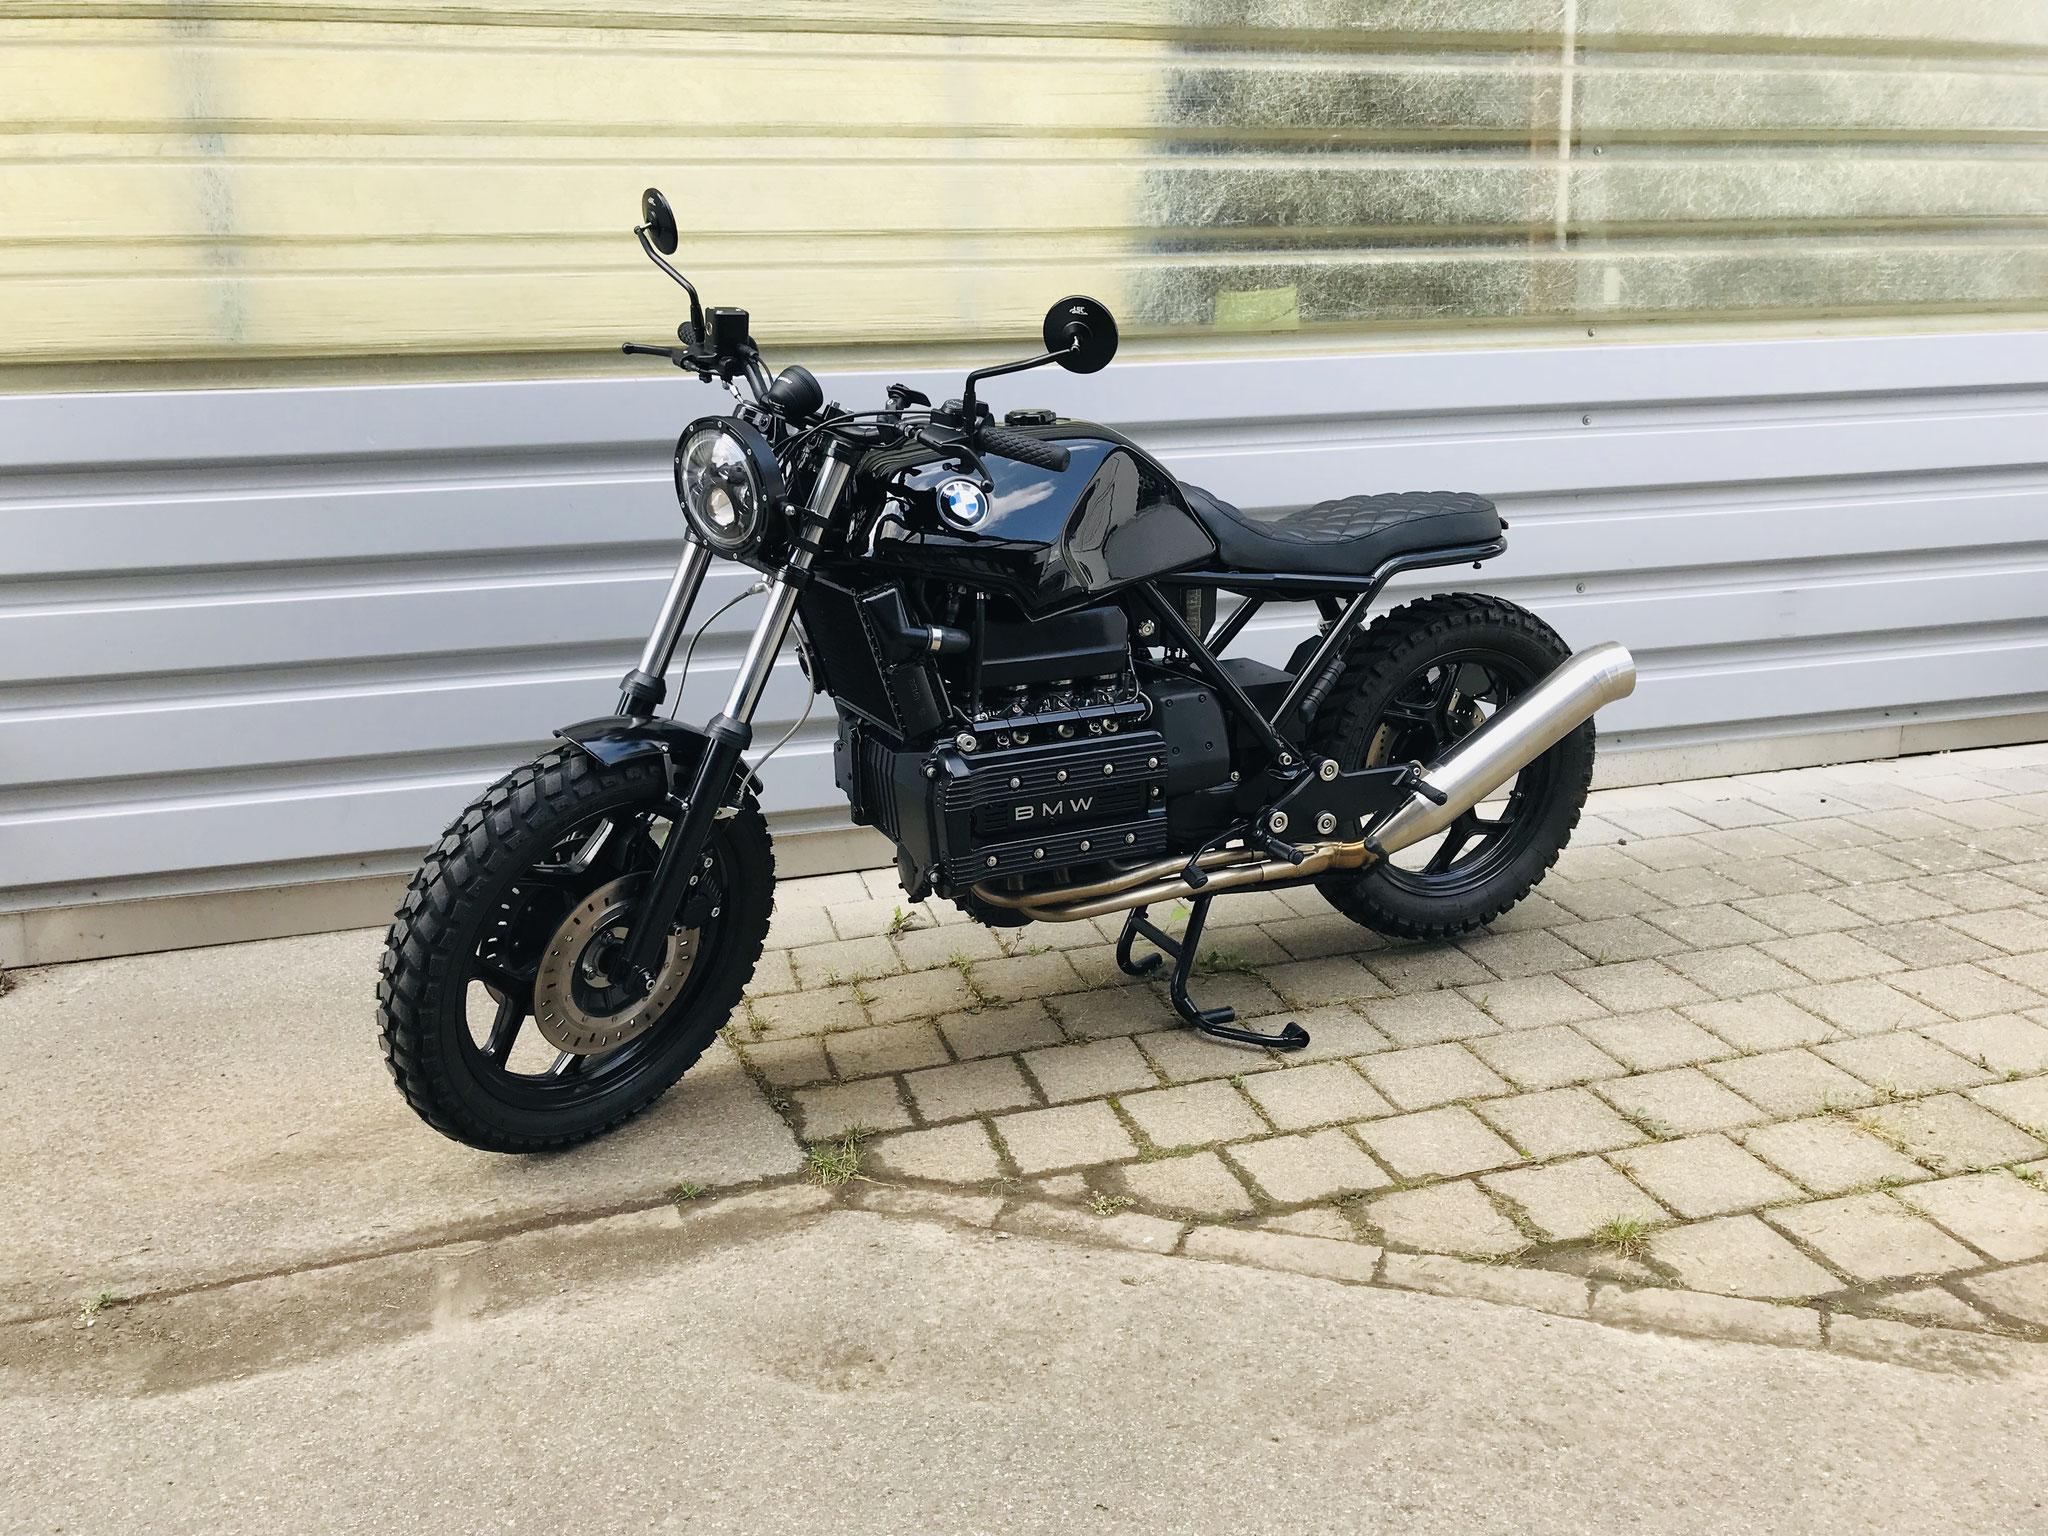 bmwrk100  handmade custom customize umbau black anthrazit clean scrambler zürich schweiz illnau umbau projekt